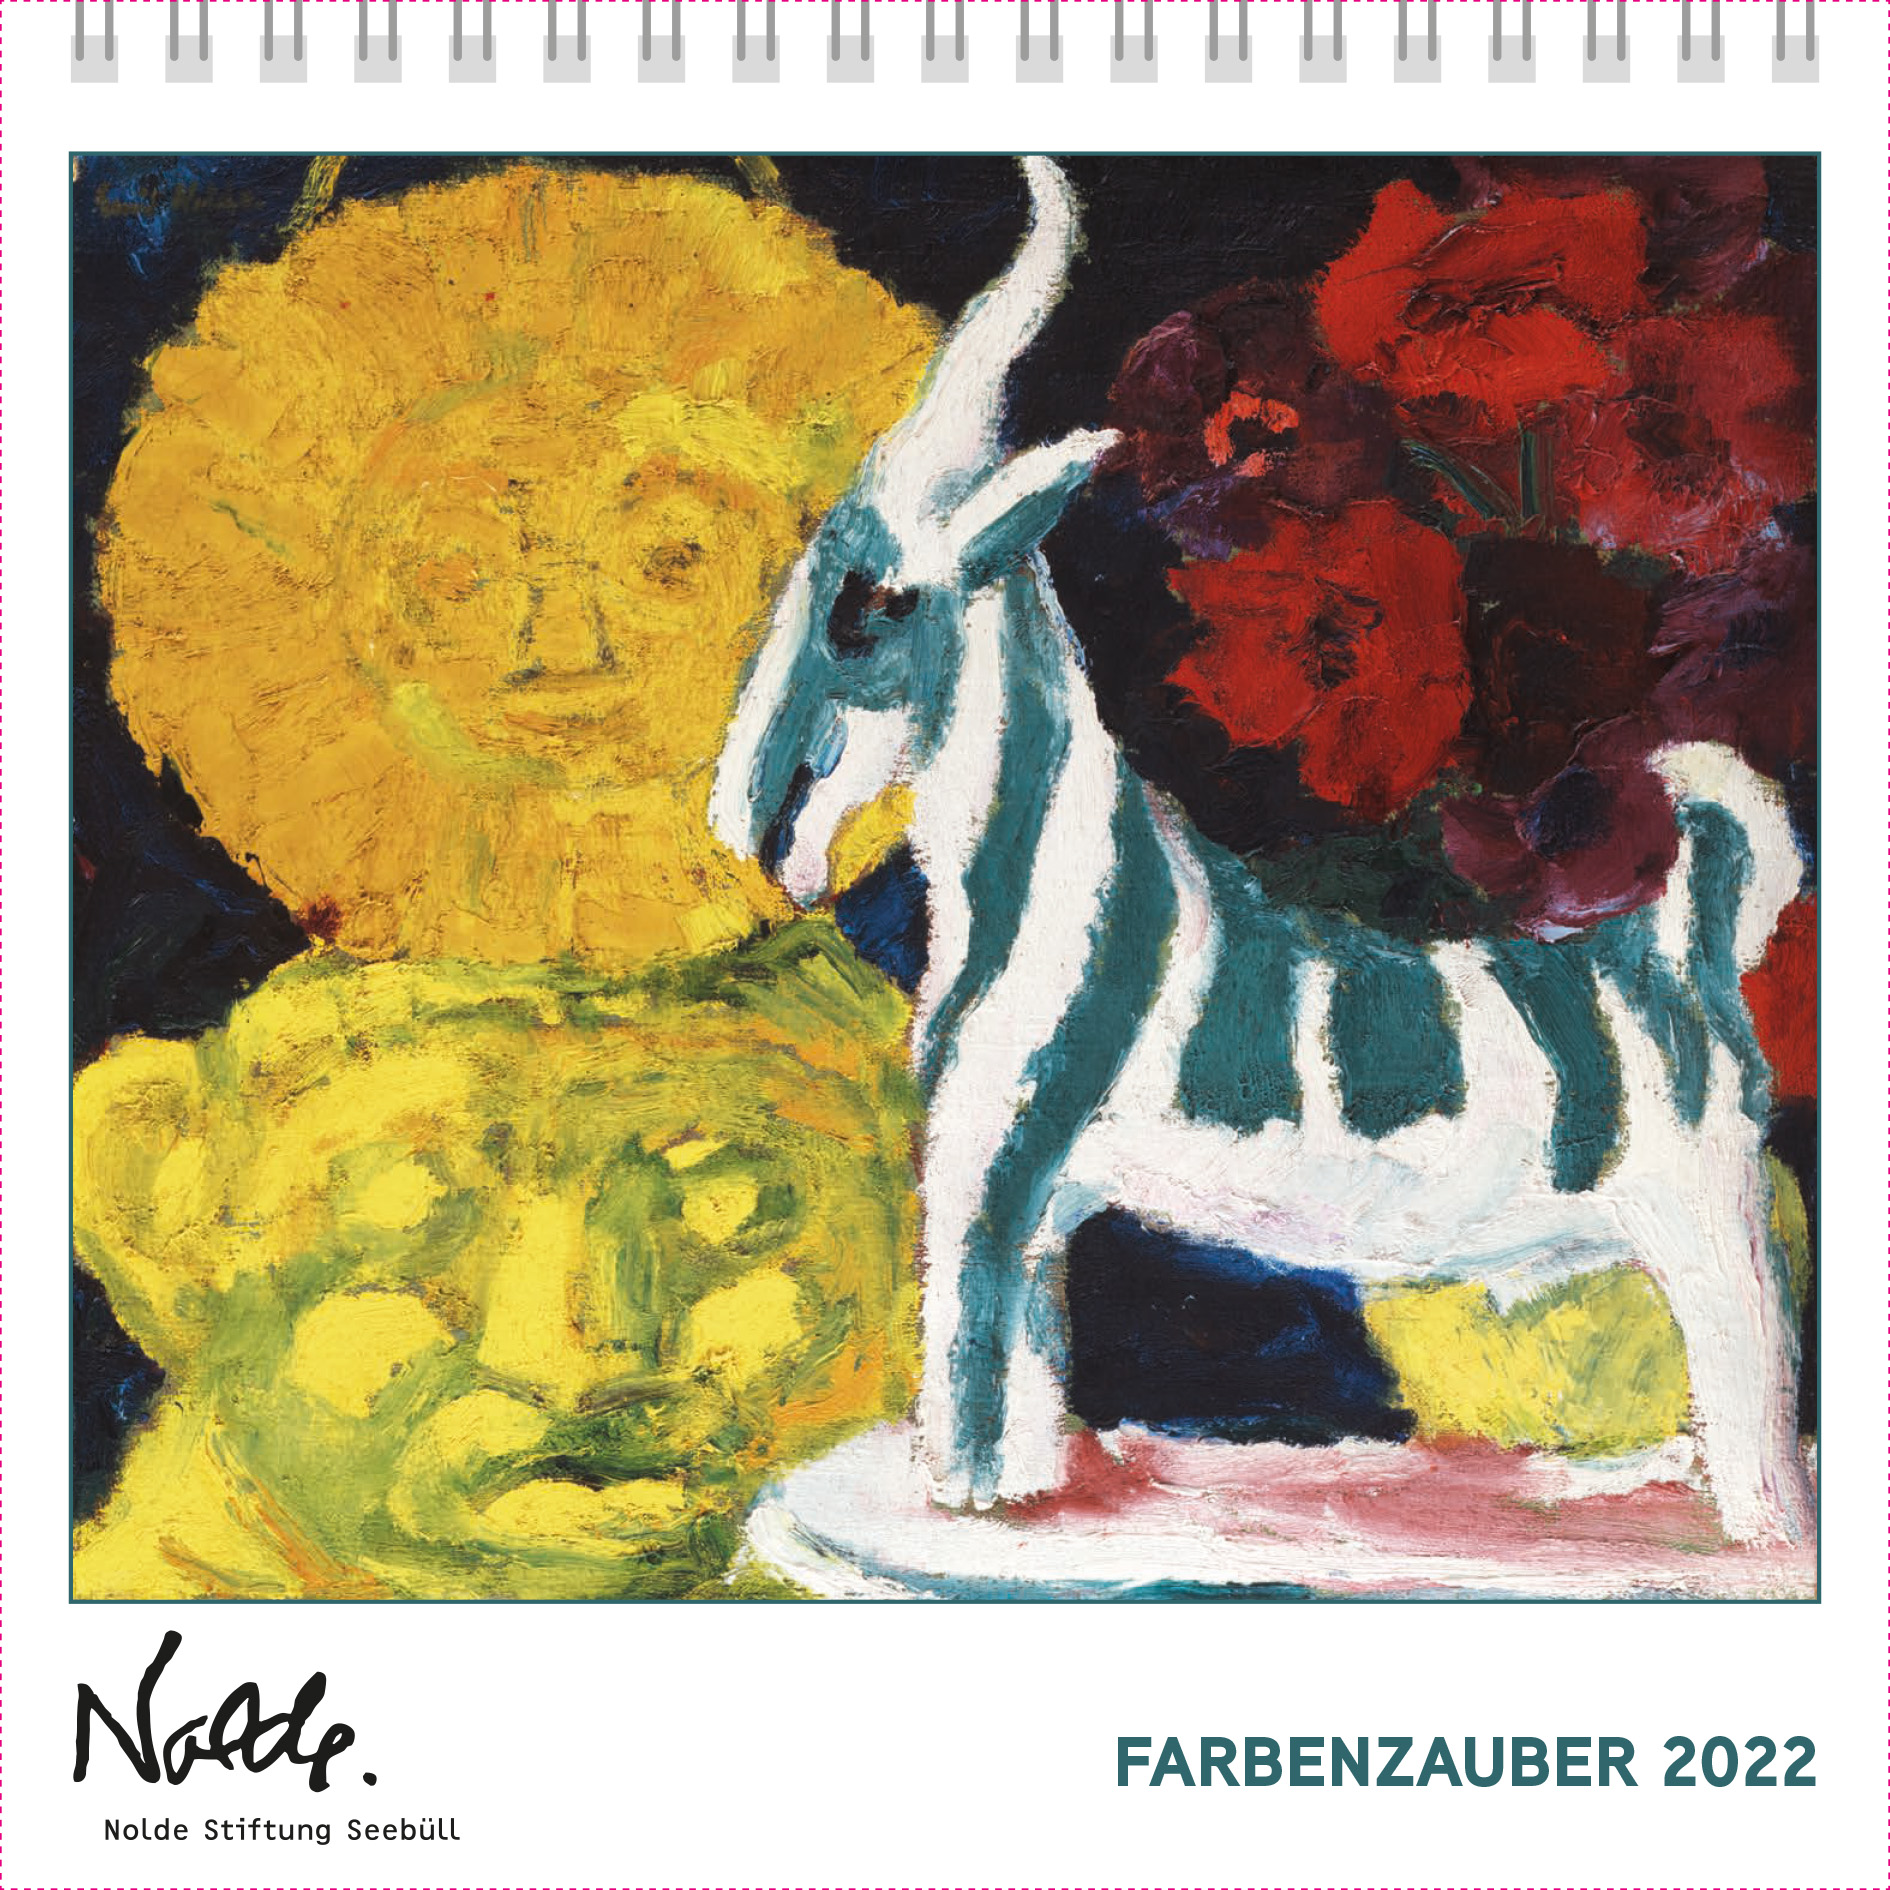 Postkartenkalender Nolde. Farbenzauber 2022